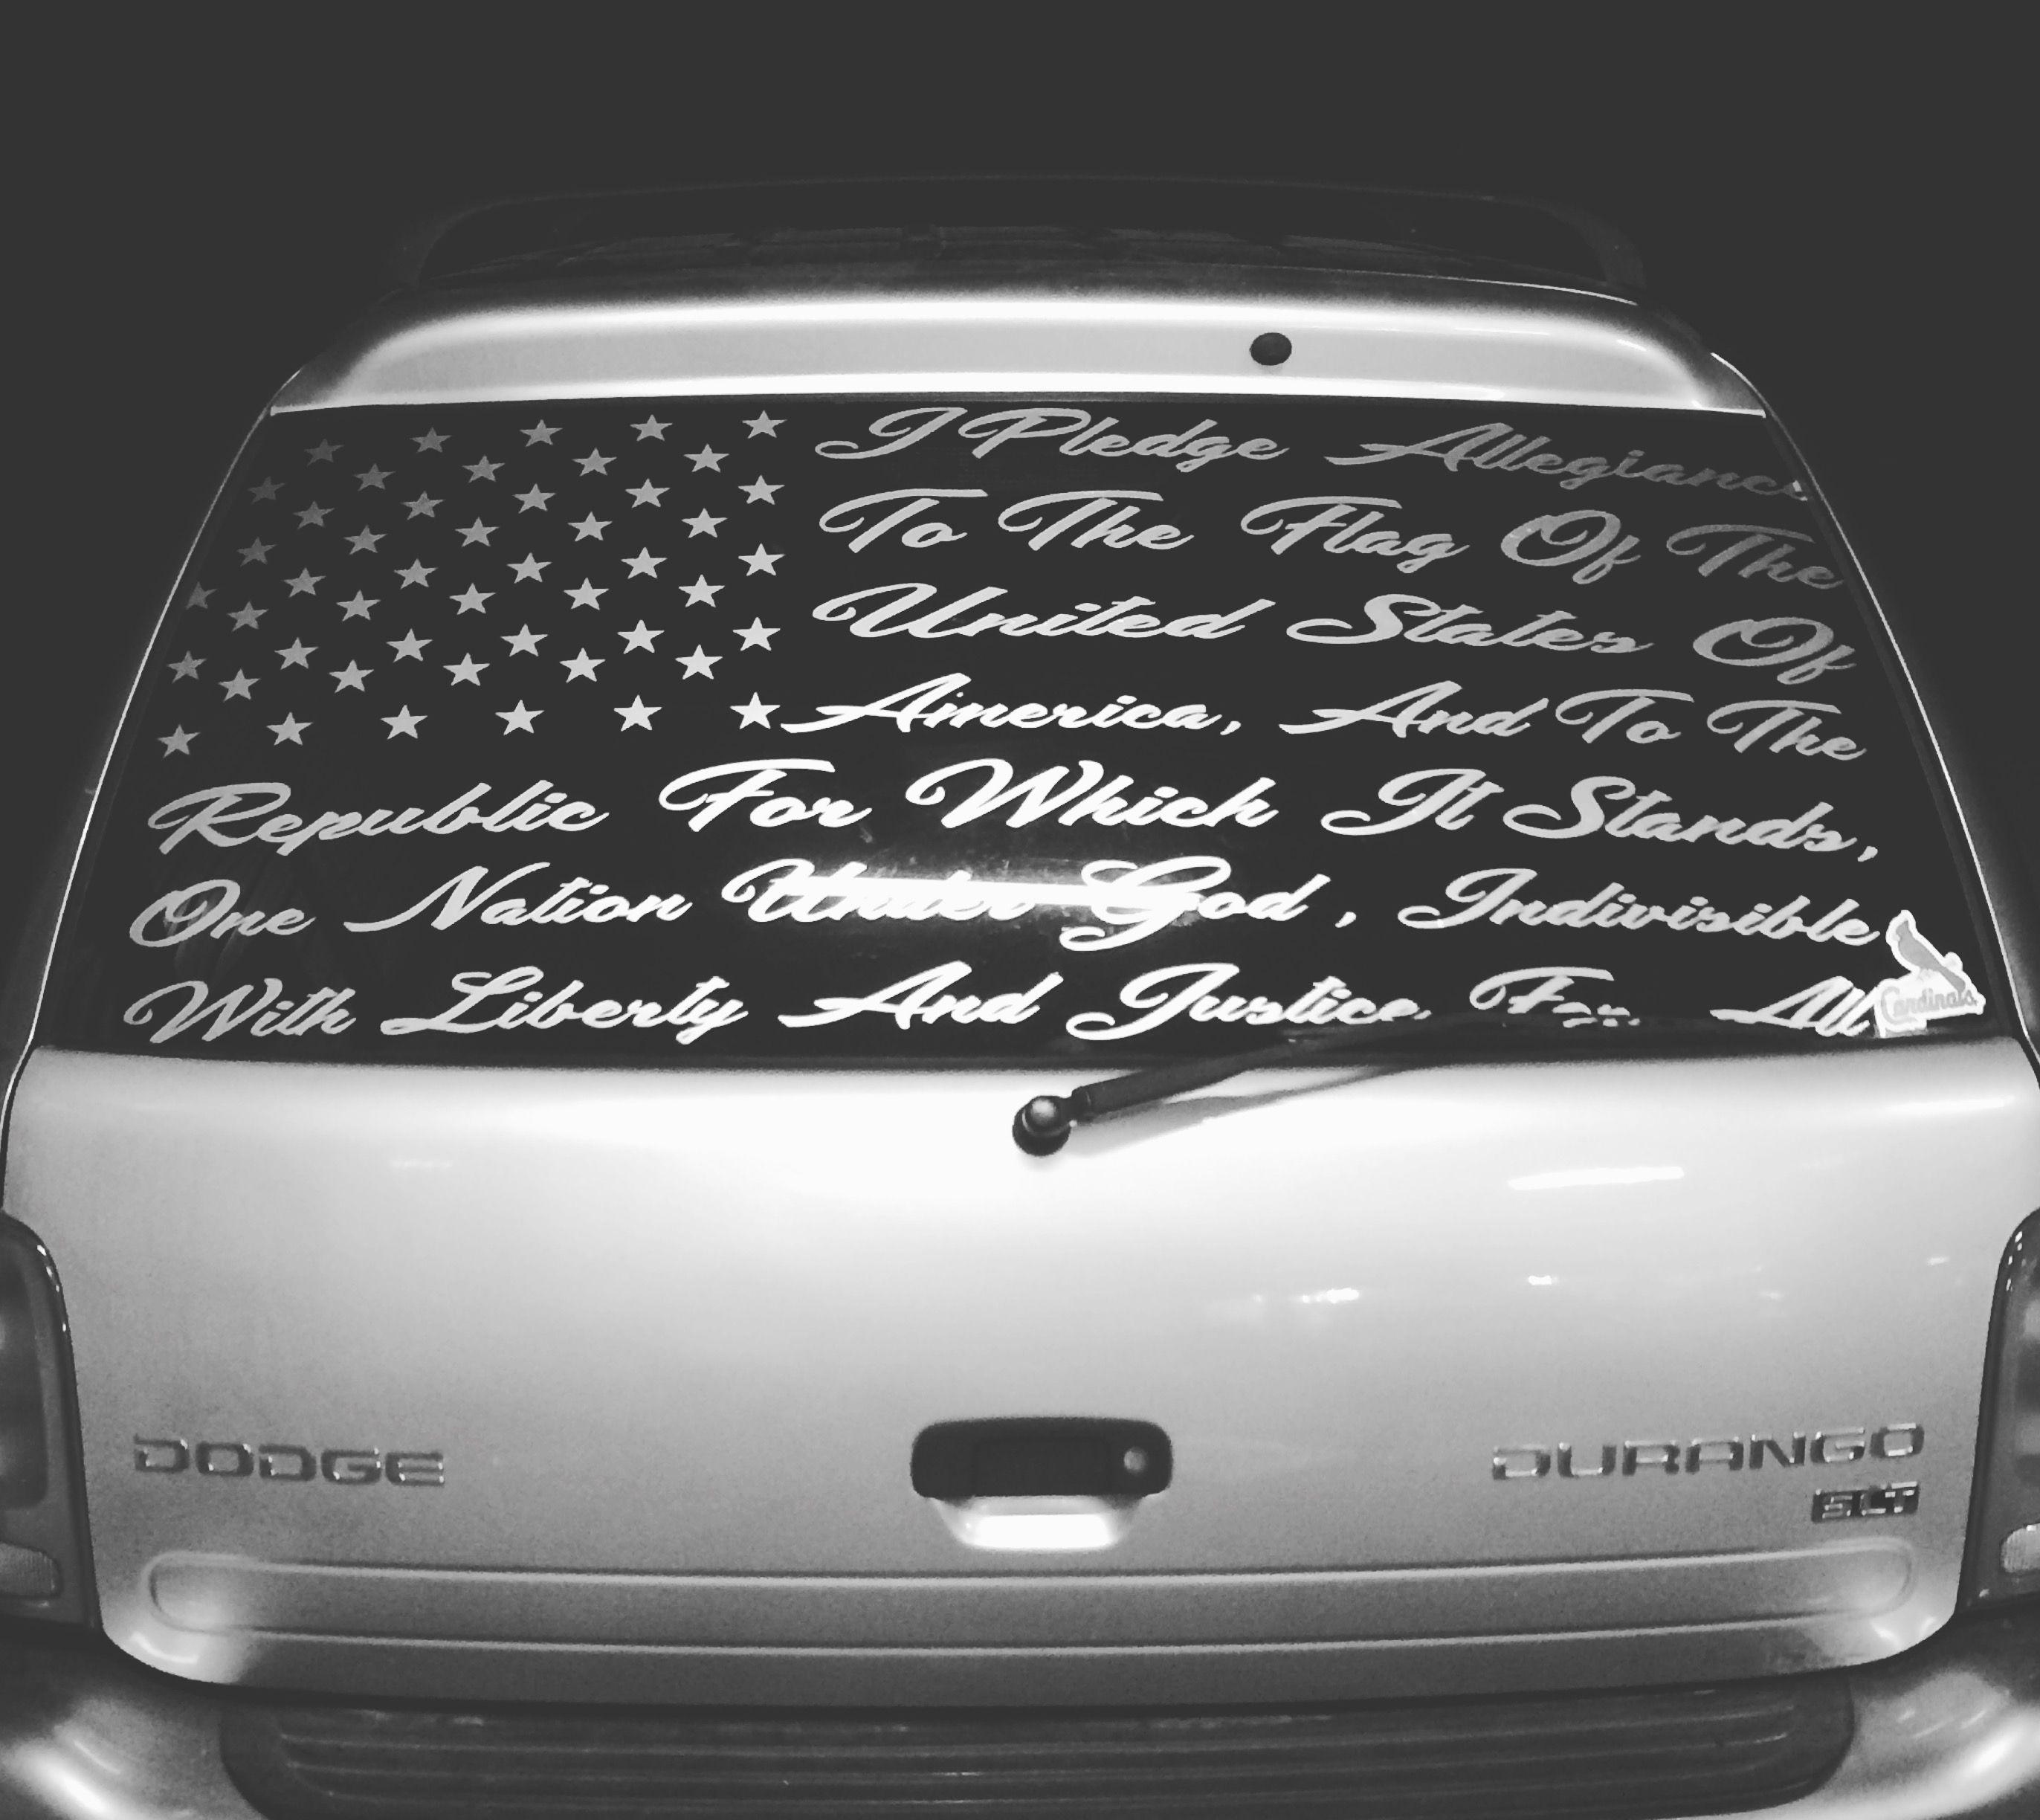 Pledge Of Allegiance Custom Decal 75 By Chris2low Vinyl Vinyl Car Stickers Window Decals Car Vinyls Car Decals Vinyl [ 2448 x 2744 Pixel ]